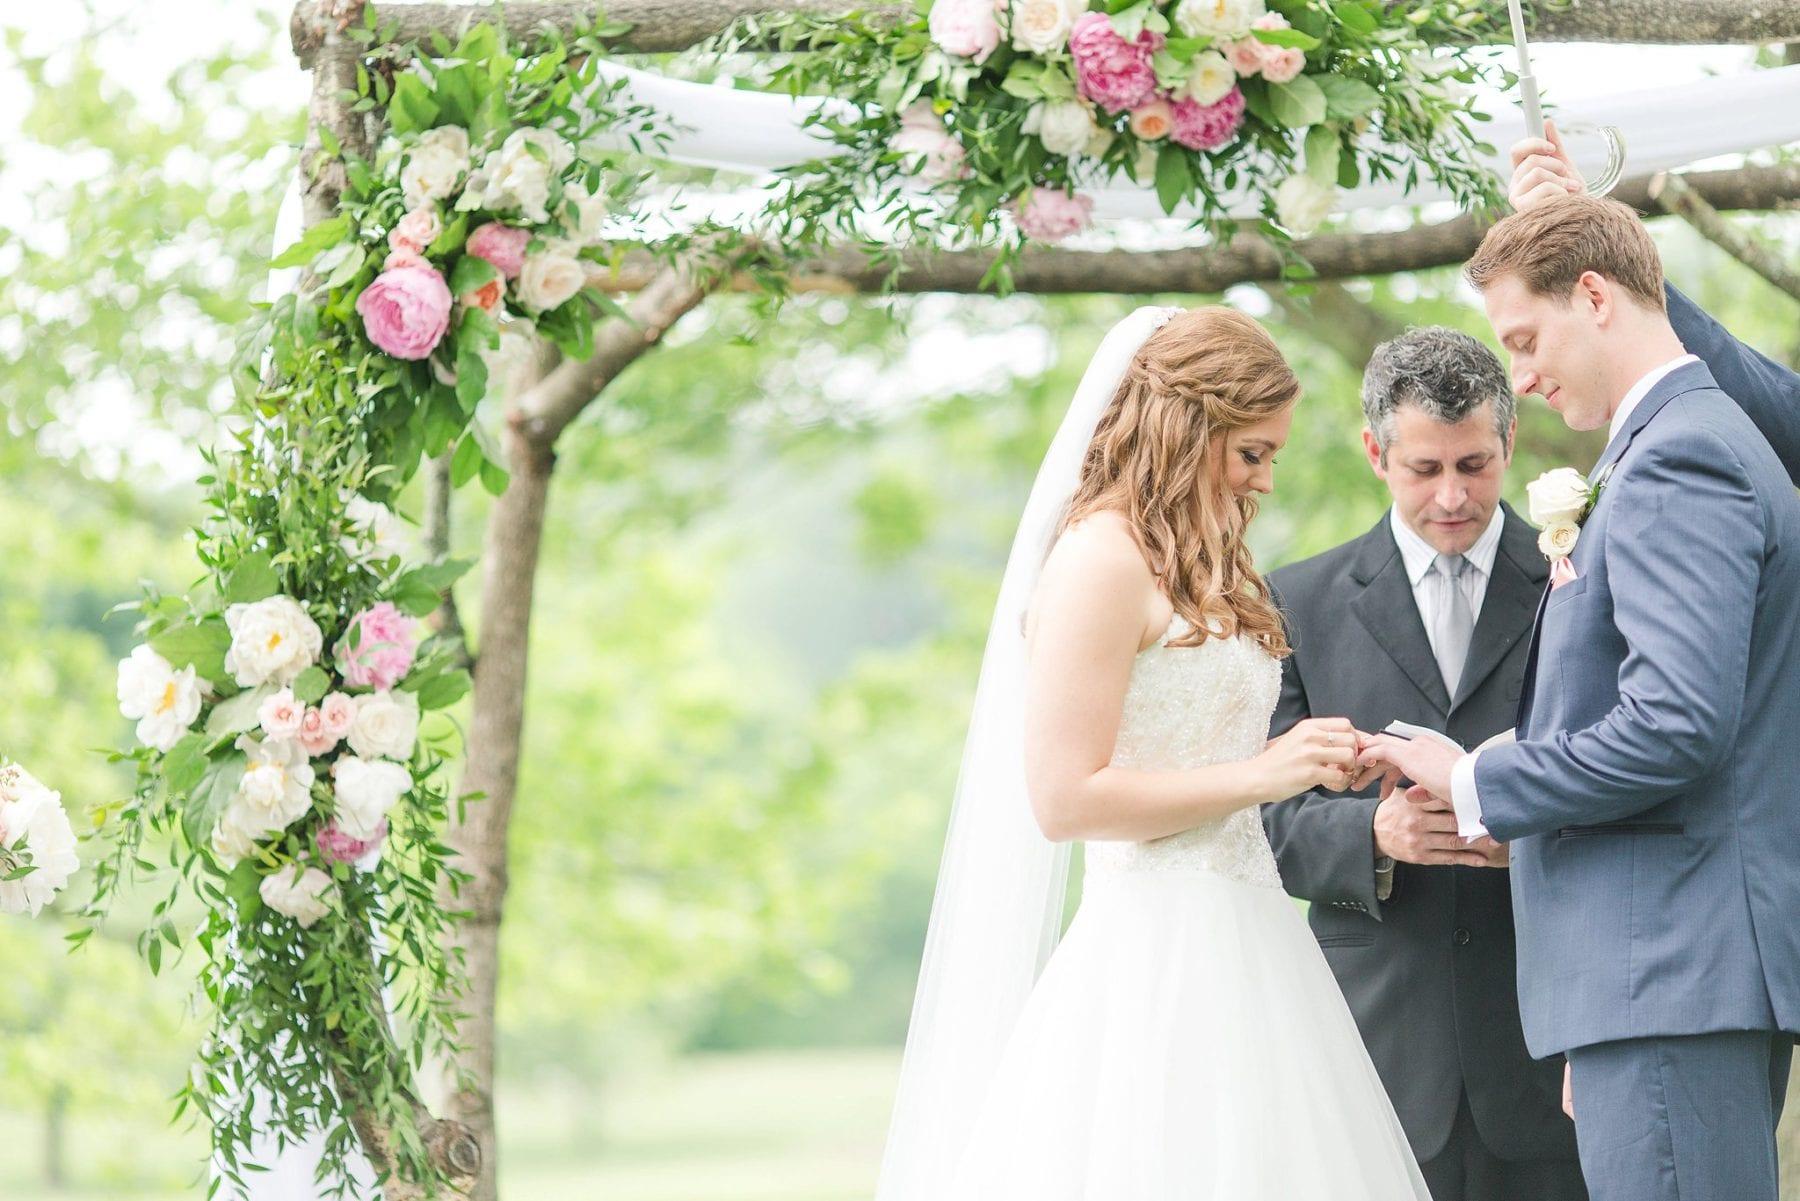 Justin & Megan Big Spring Farm Wedding Photos-266.jpg